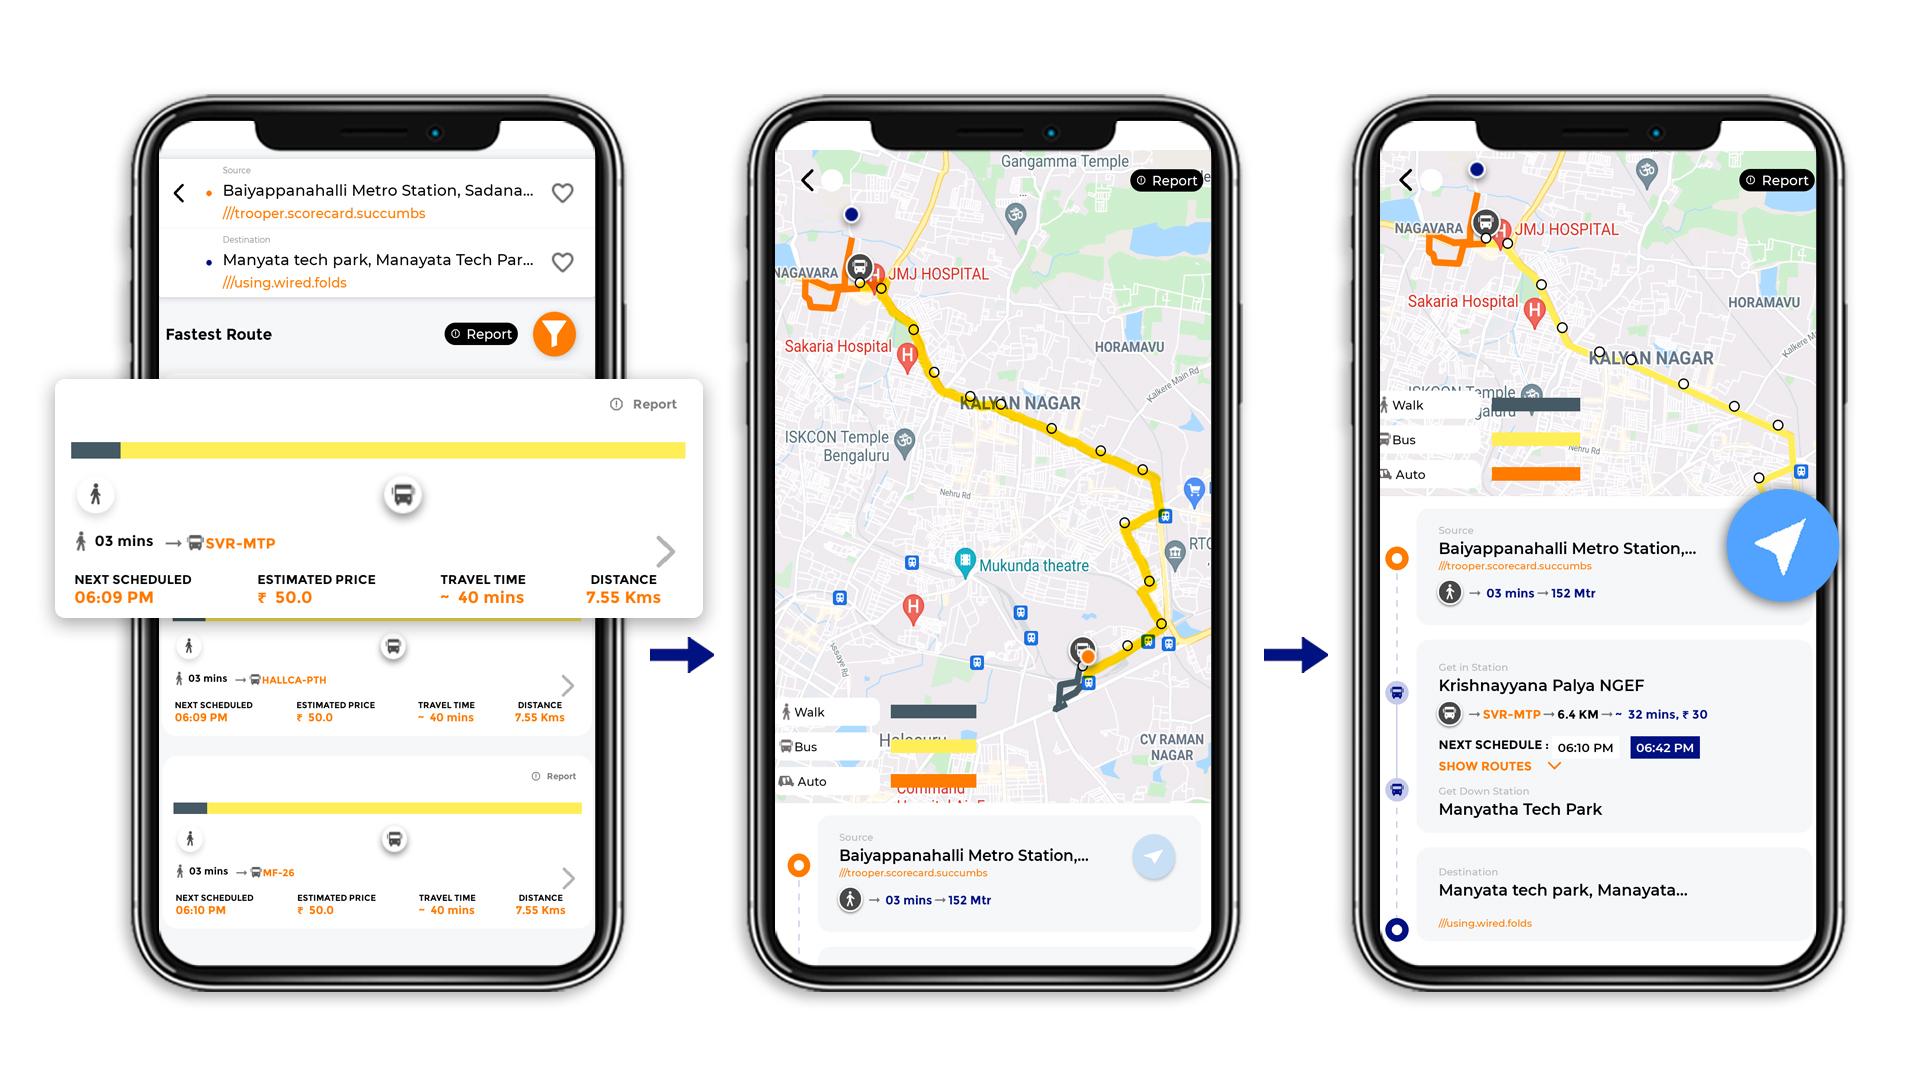 Tummoc, Tummoc app, Baiyannahalli metro station, Manyata Tech park, Public transport